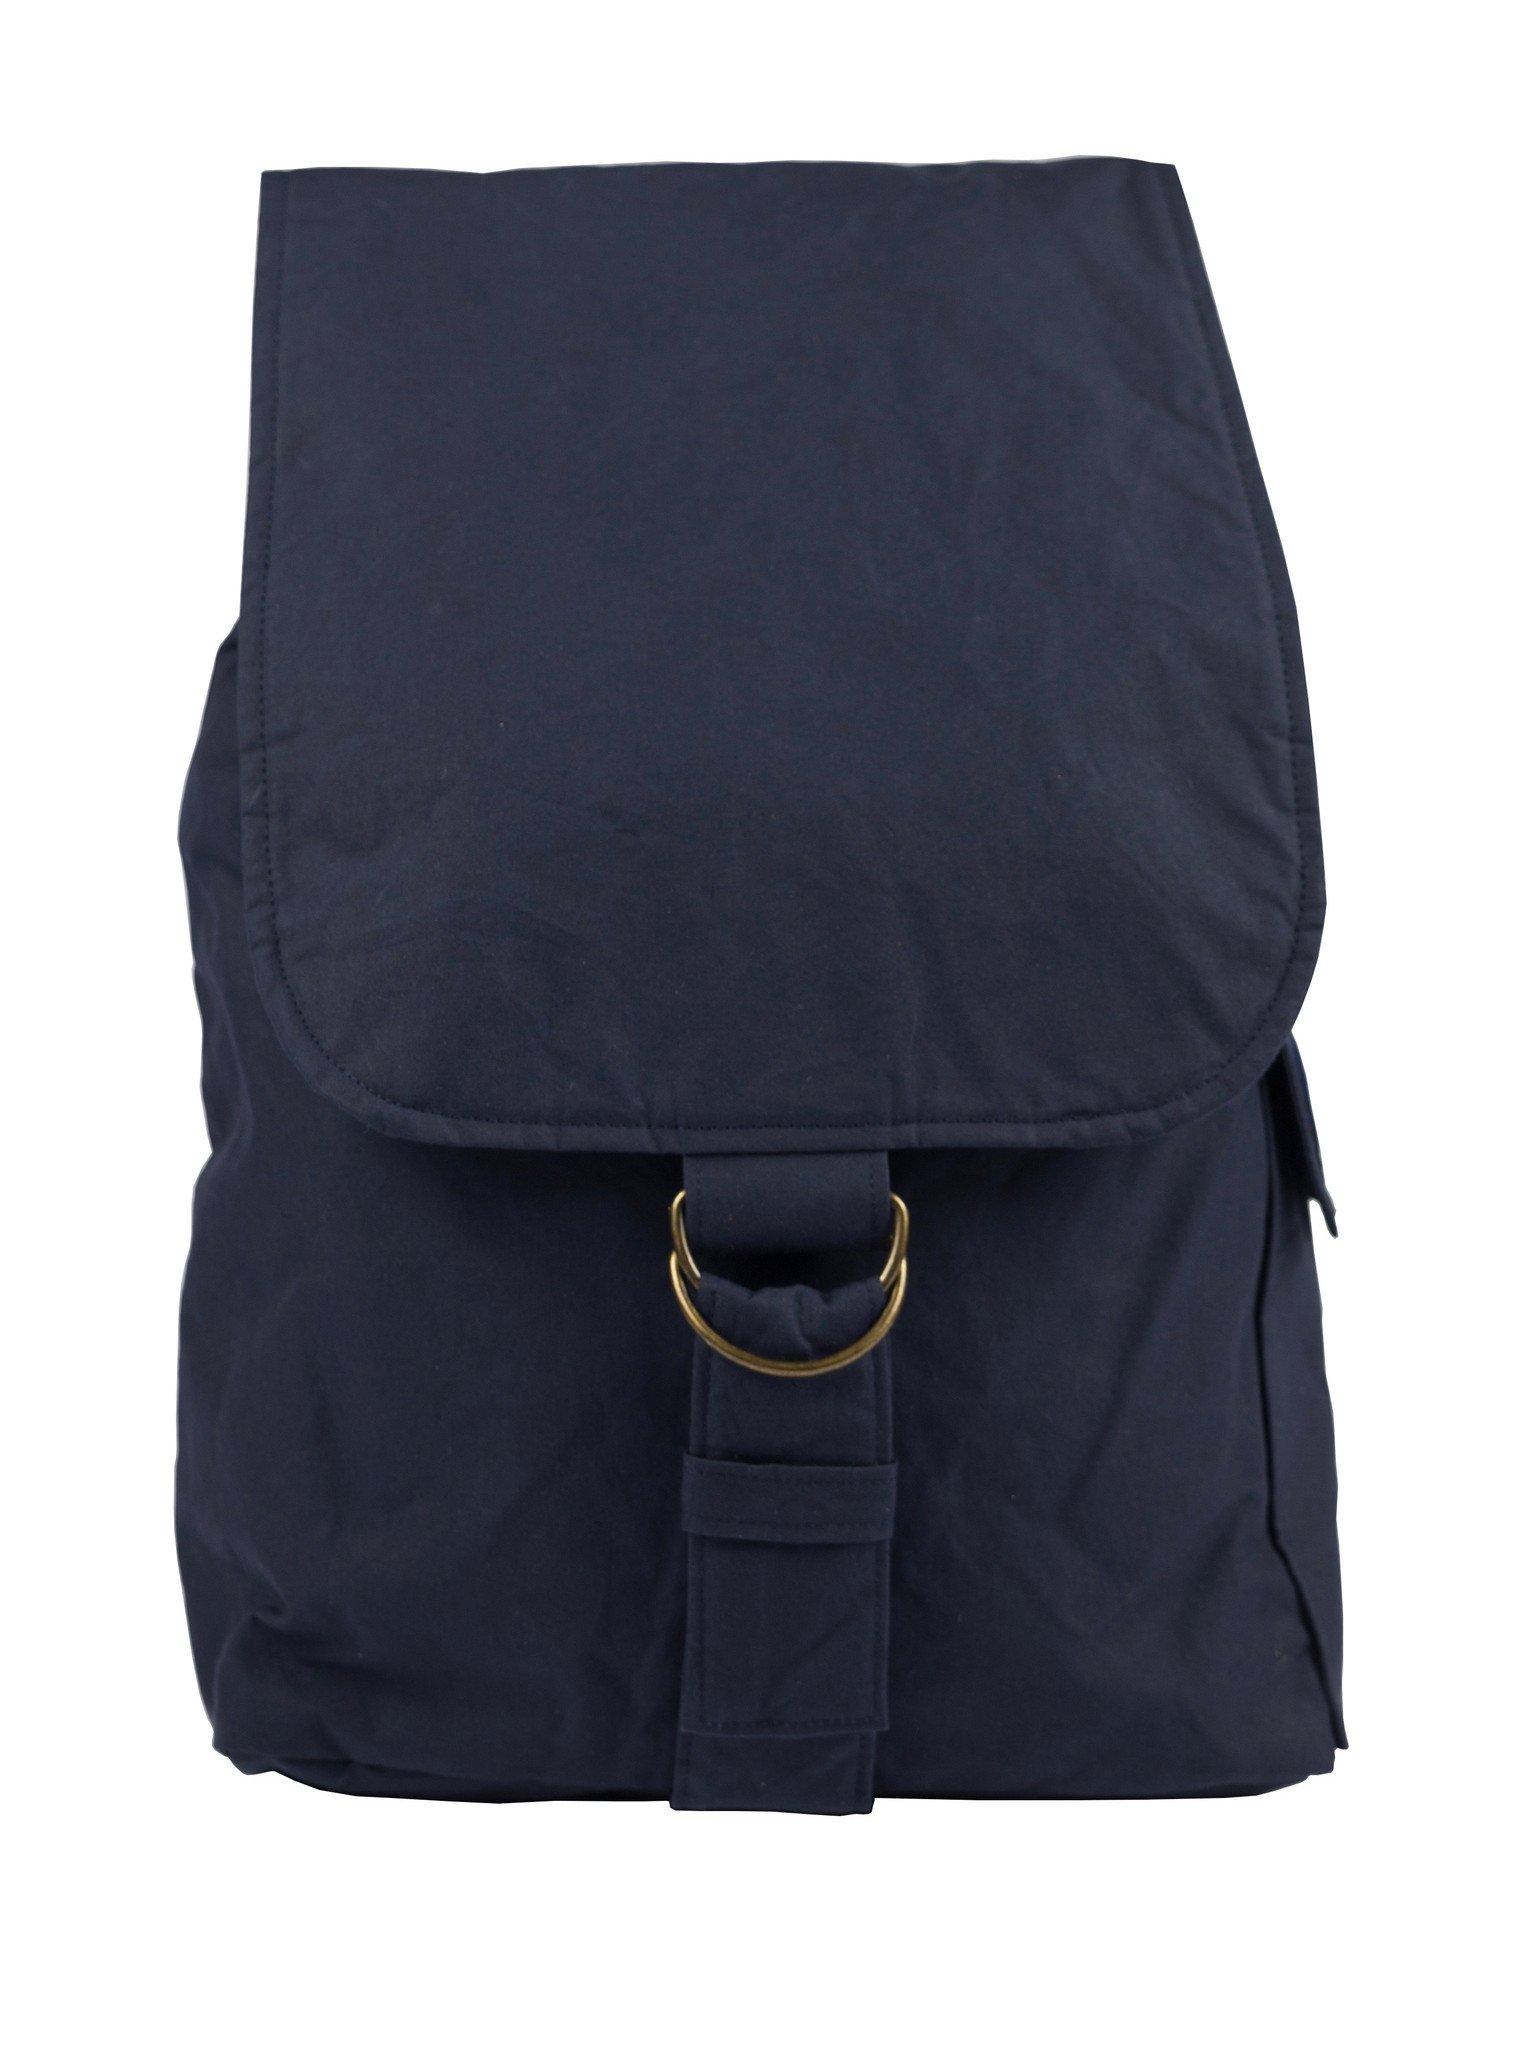 Bax and Bay Navy Zack rucksack, £129